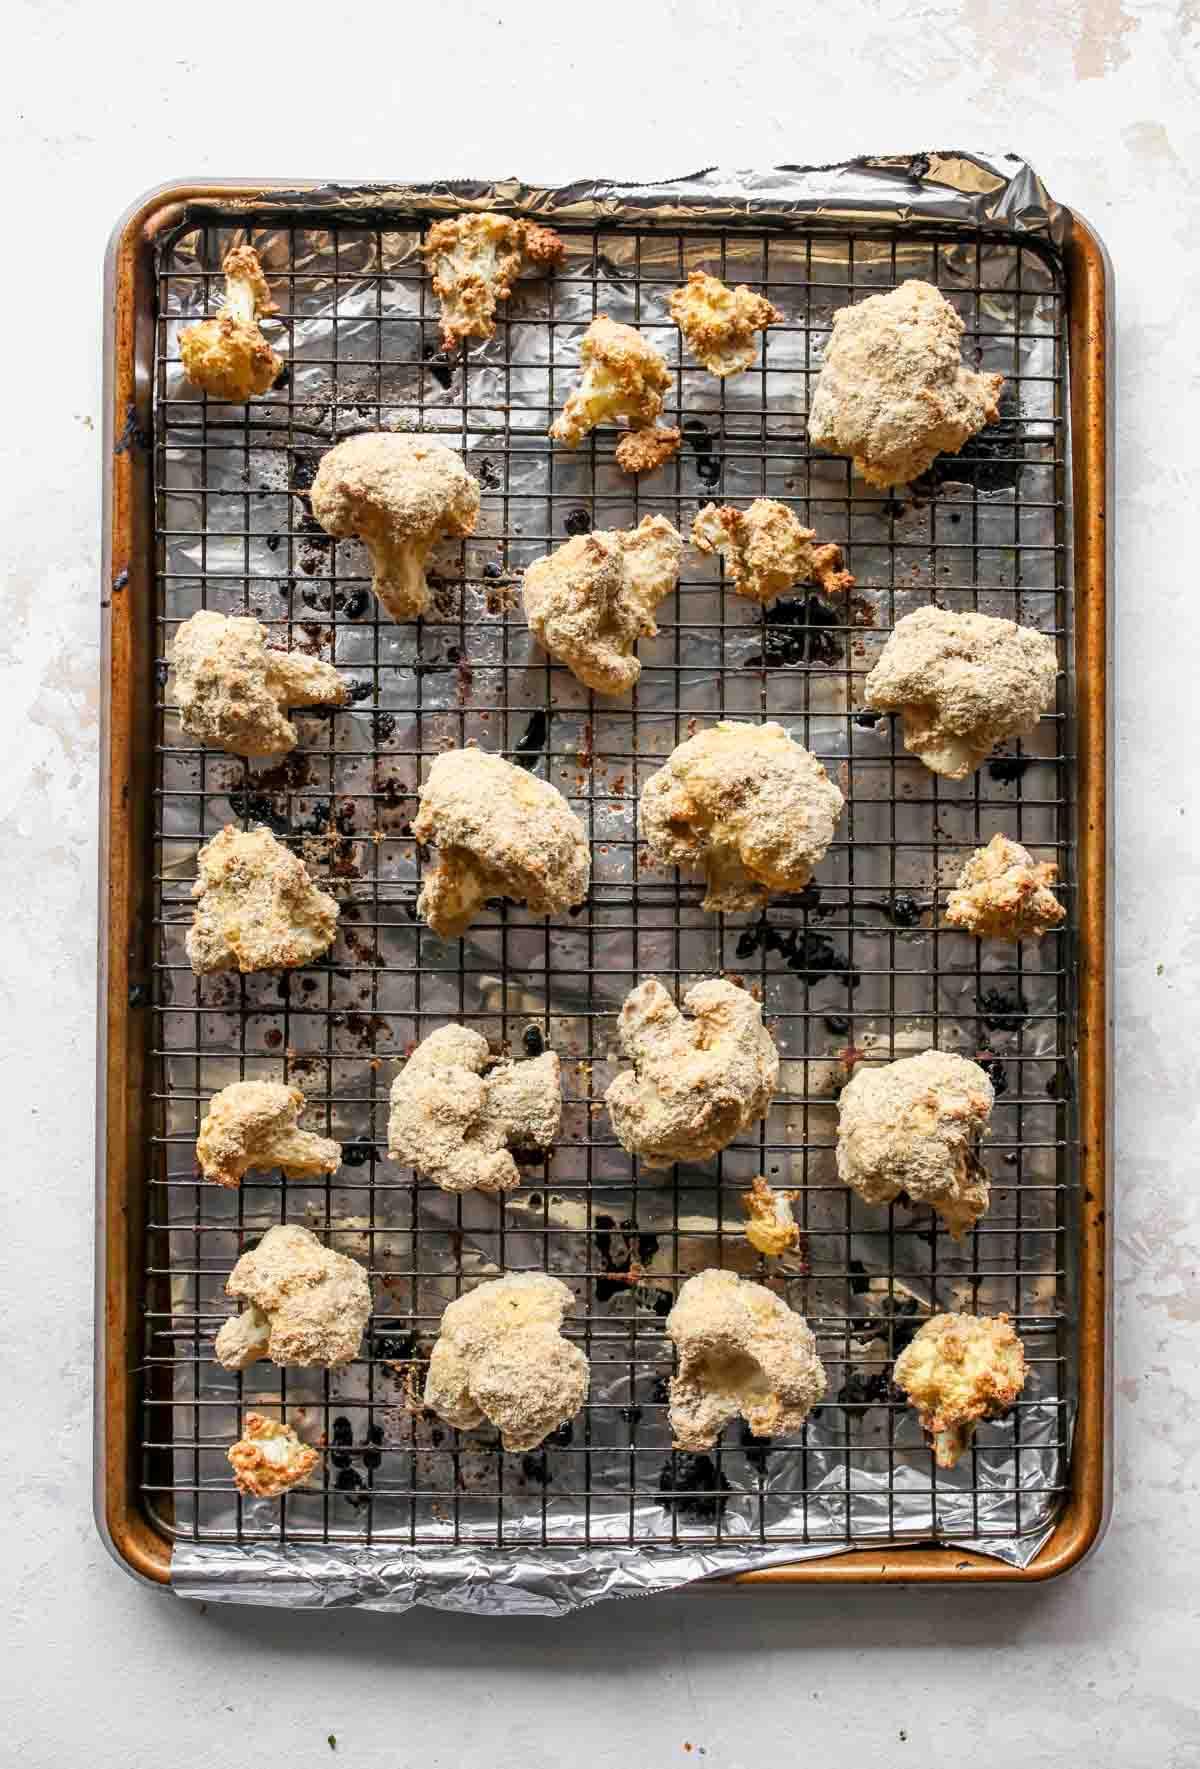 Breaded cauliflower florets on a prepared baking sheet